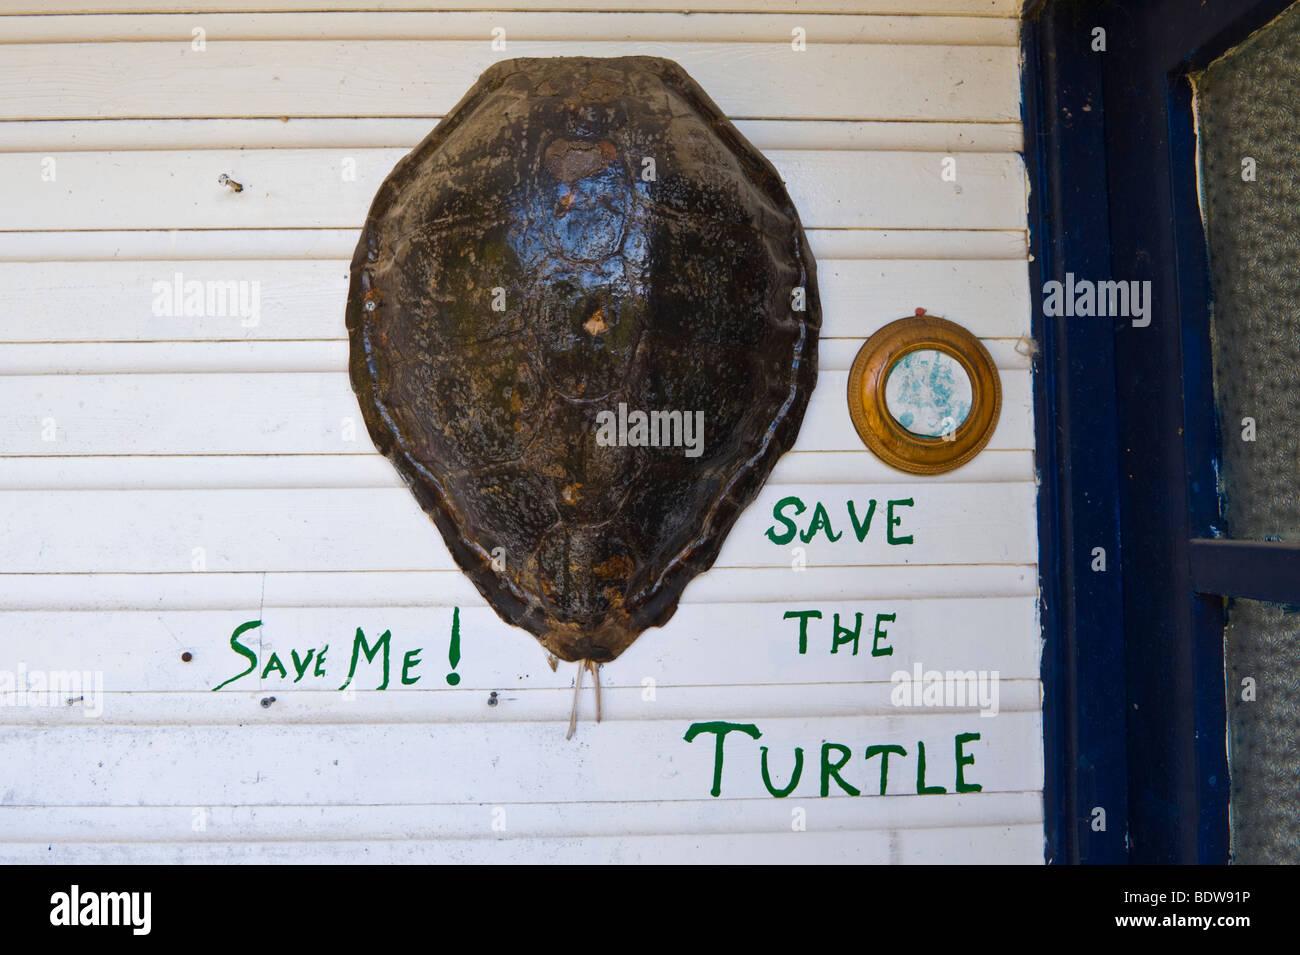 SAVE THE TURTLE Loggerhead turtle shell outside house in Skala on the Greek Mediterranean island of Kefalonia Greece GR Stock Photo